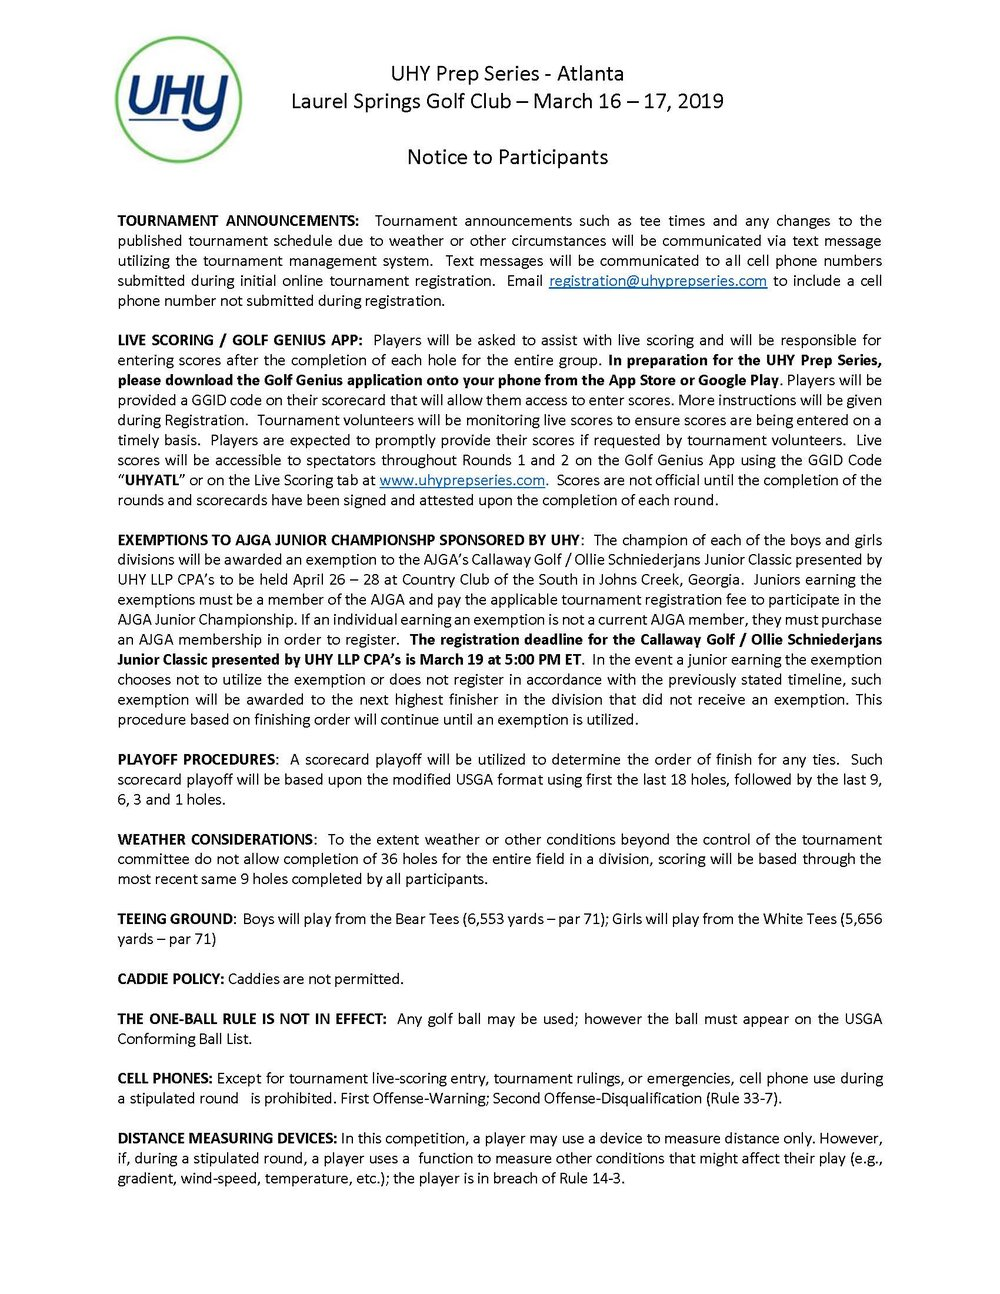 Rules Sheet - UHY Prep Series - Atlanta (MAR 16 - 17 2019)_Page_1.jpg